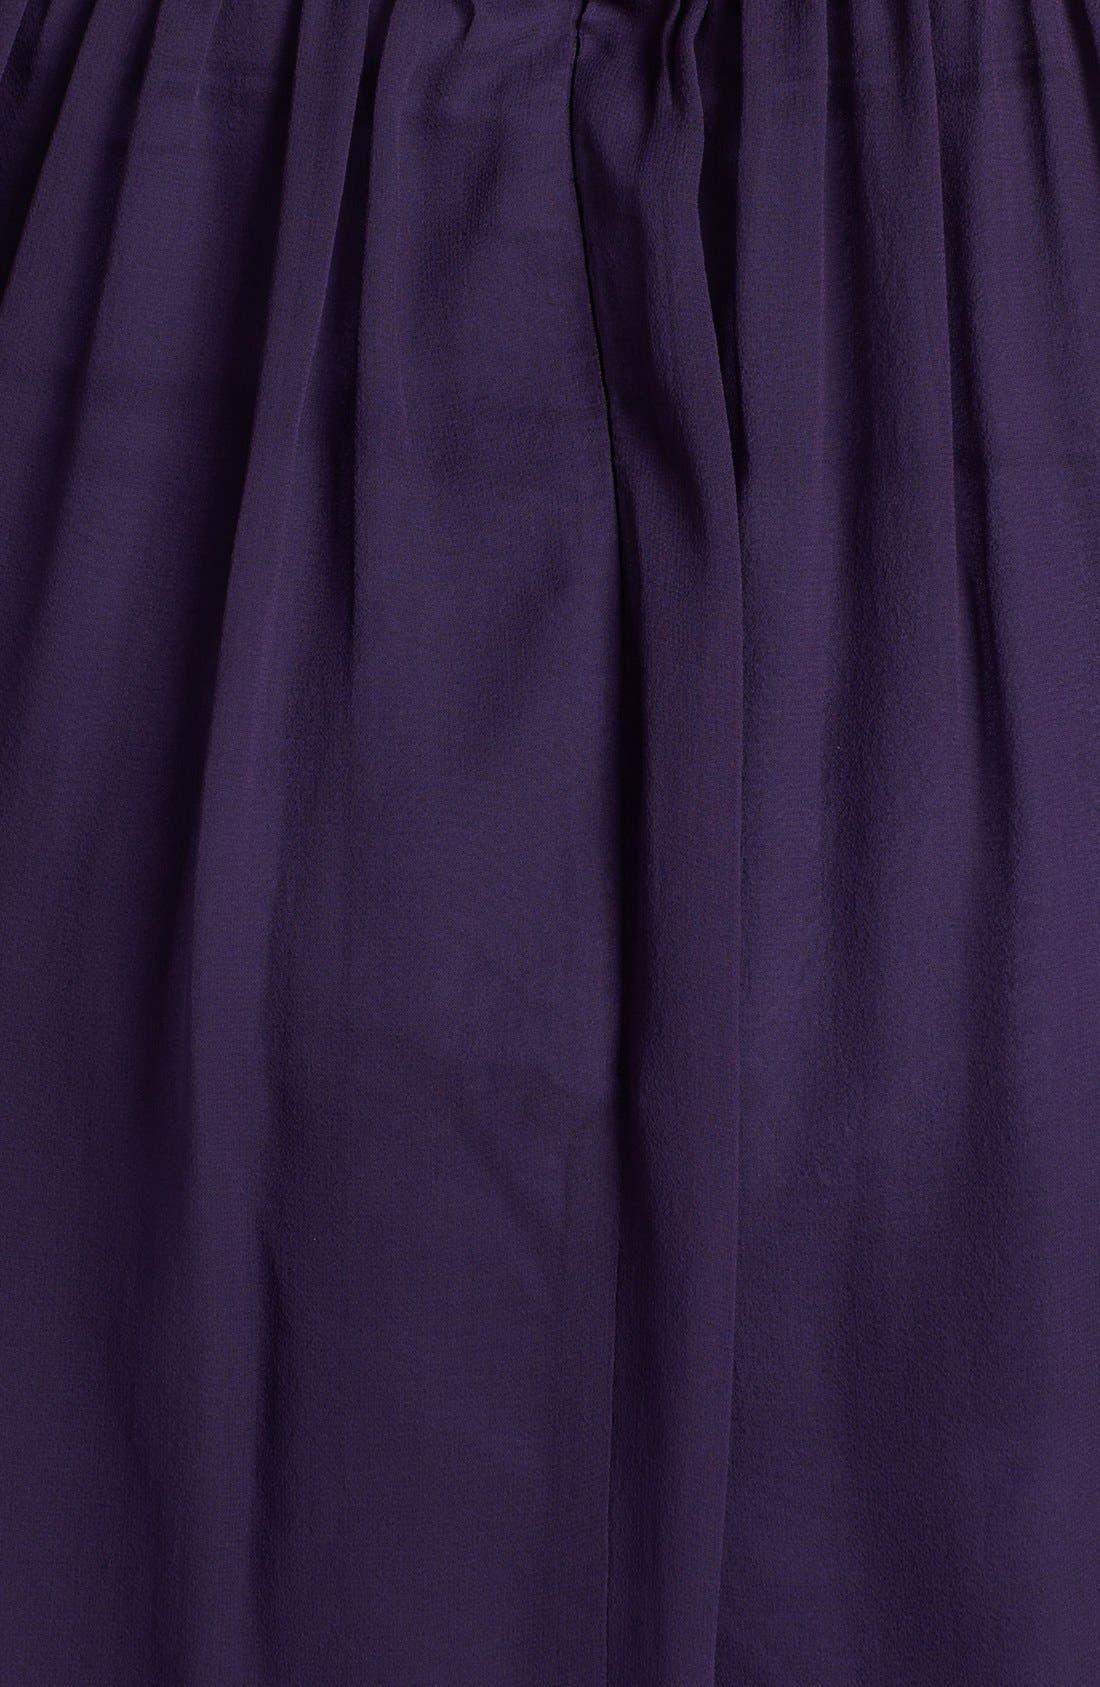 'Morgan' Strapless Silk Chiffon Dress,                             Alternate thumbnail 115, color,